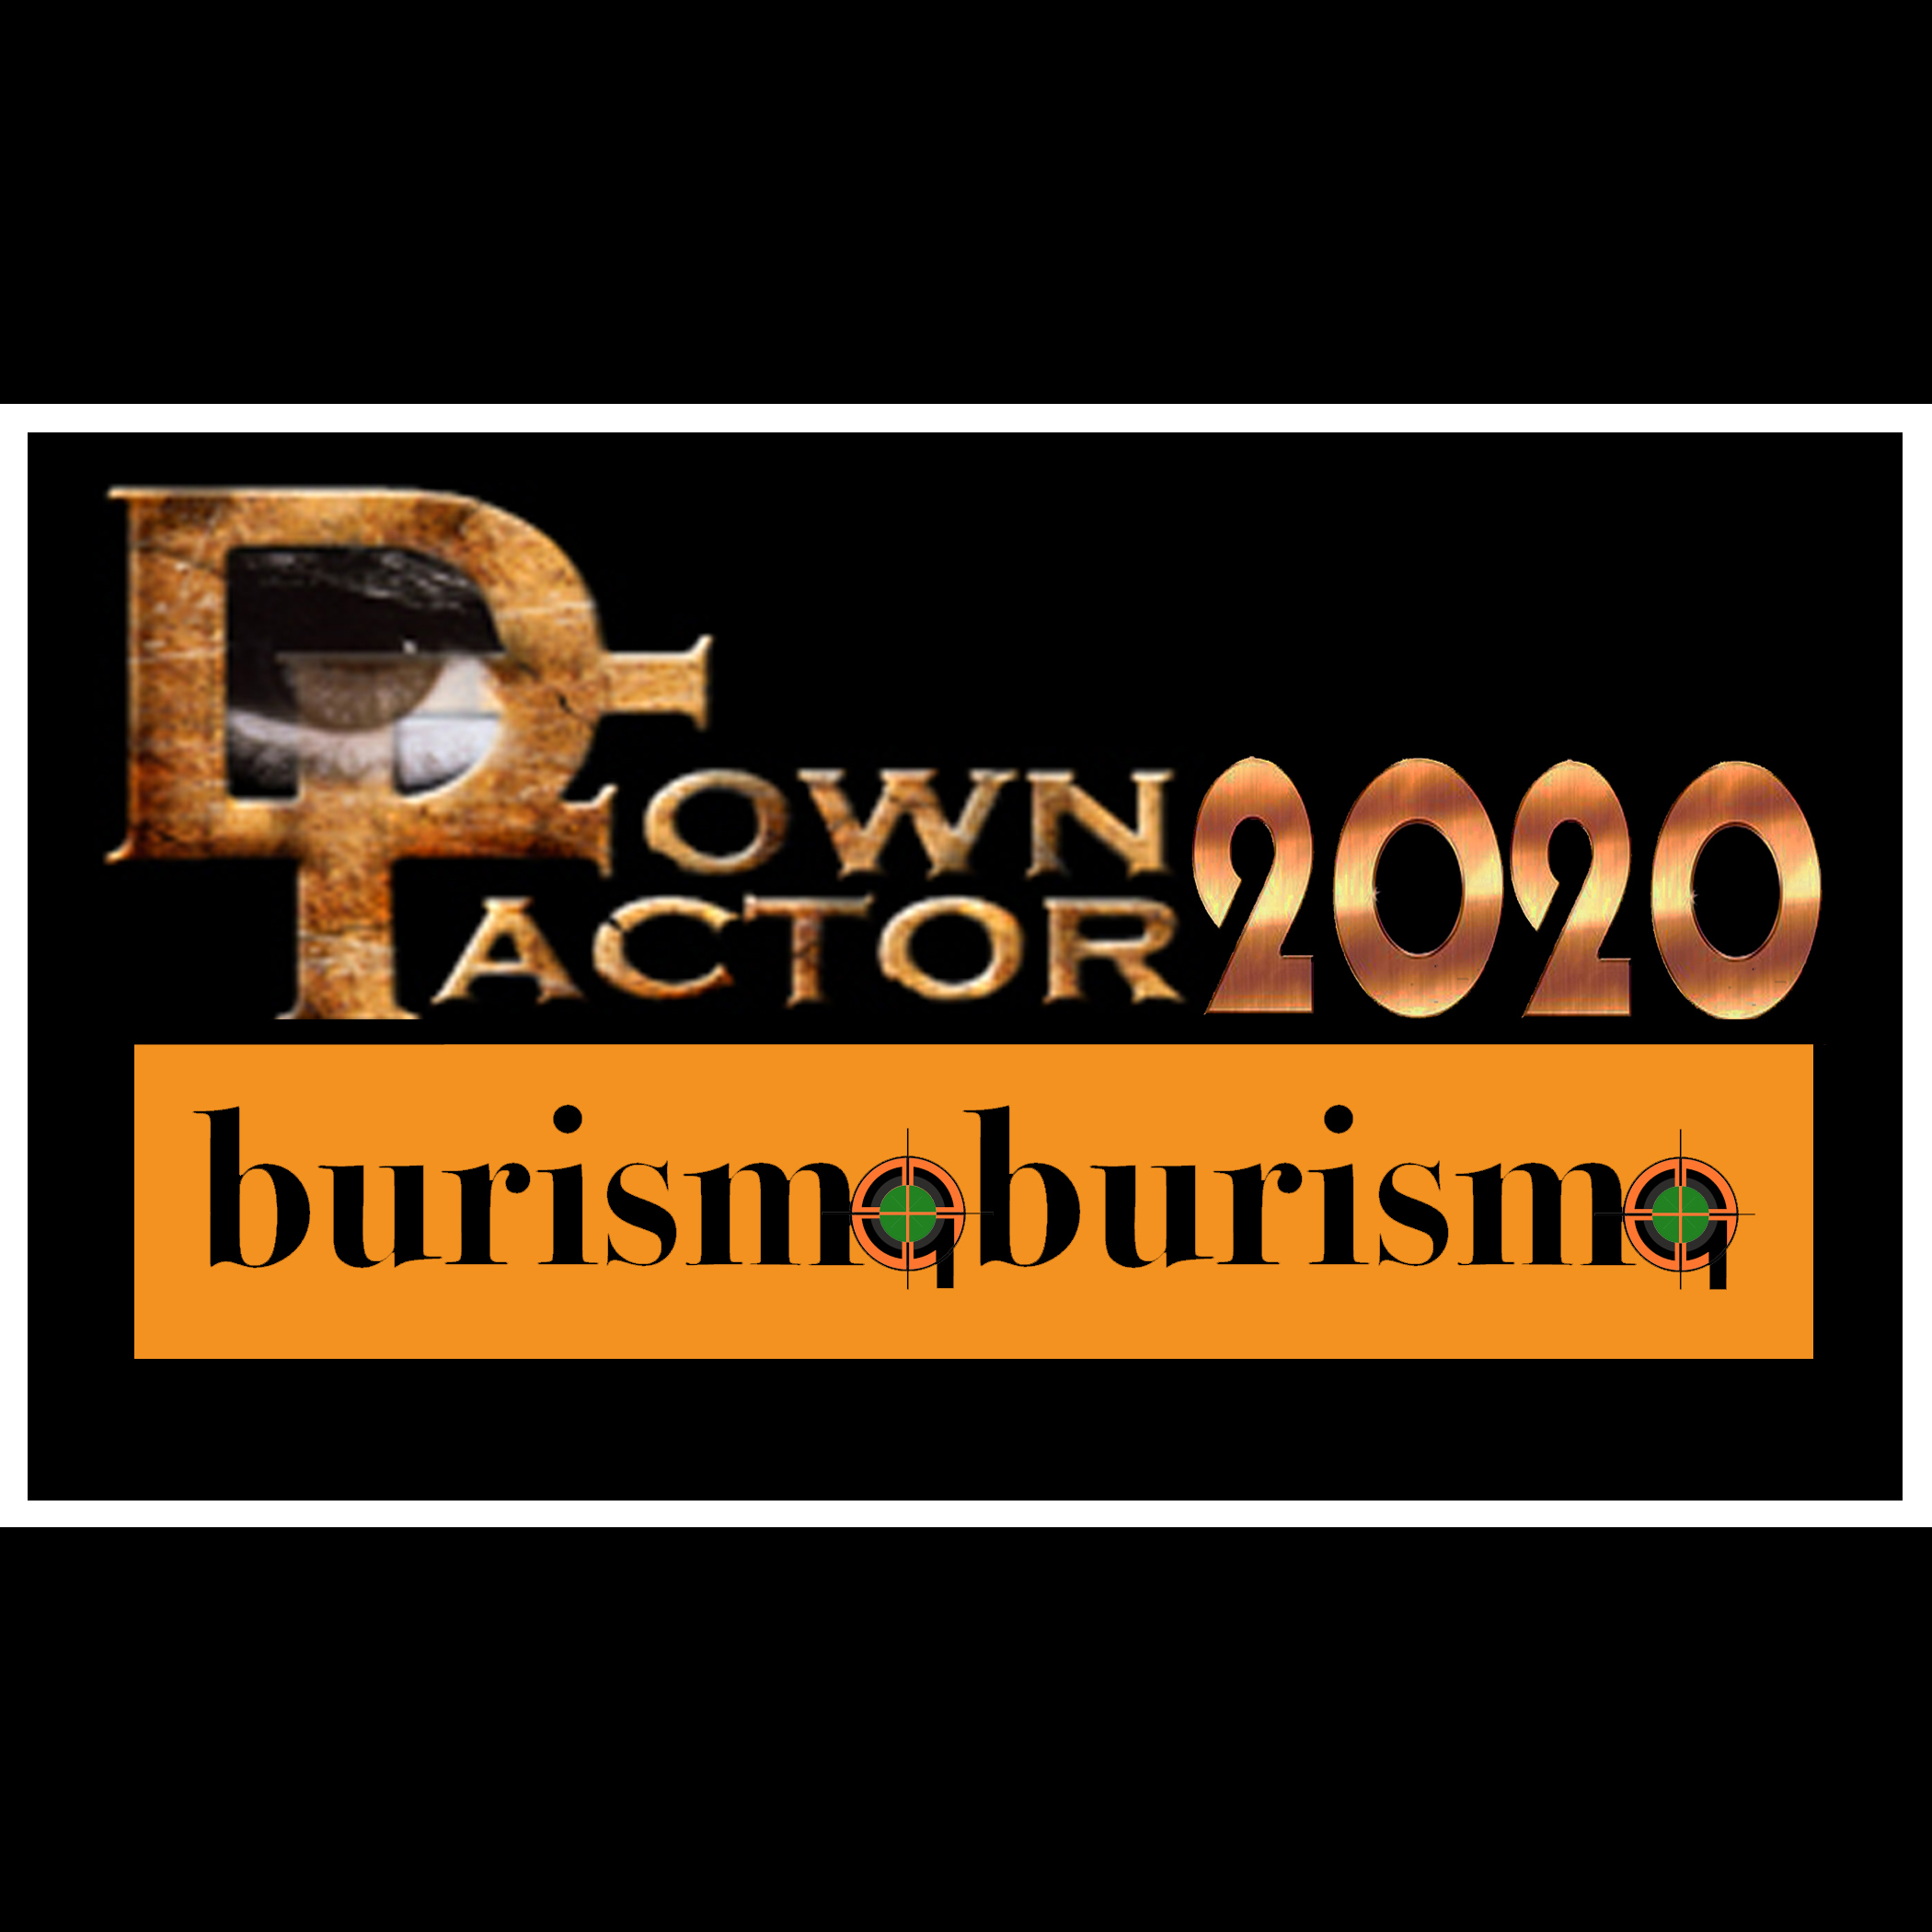 Down Factor - Burismaburisma